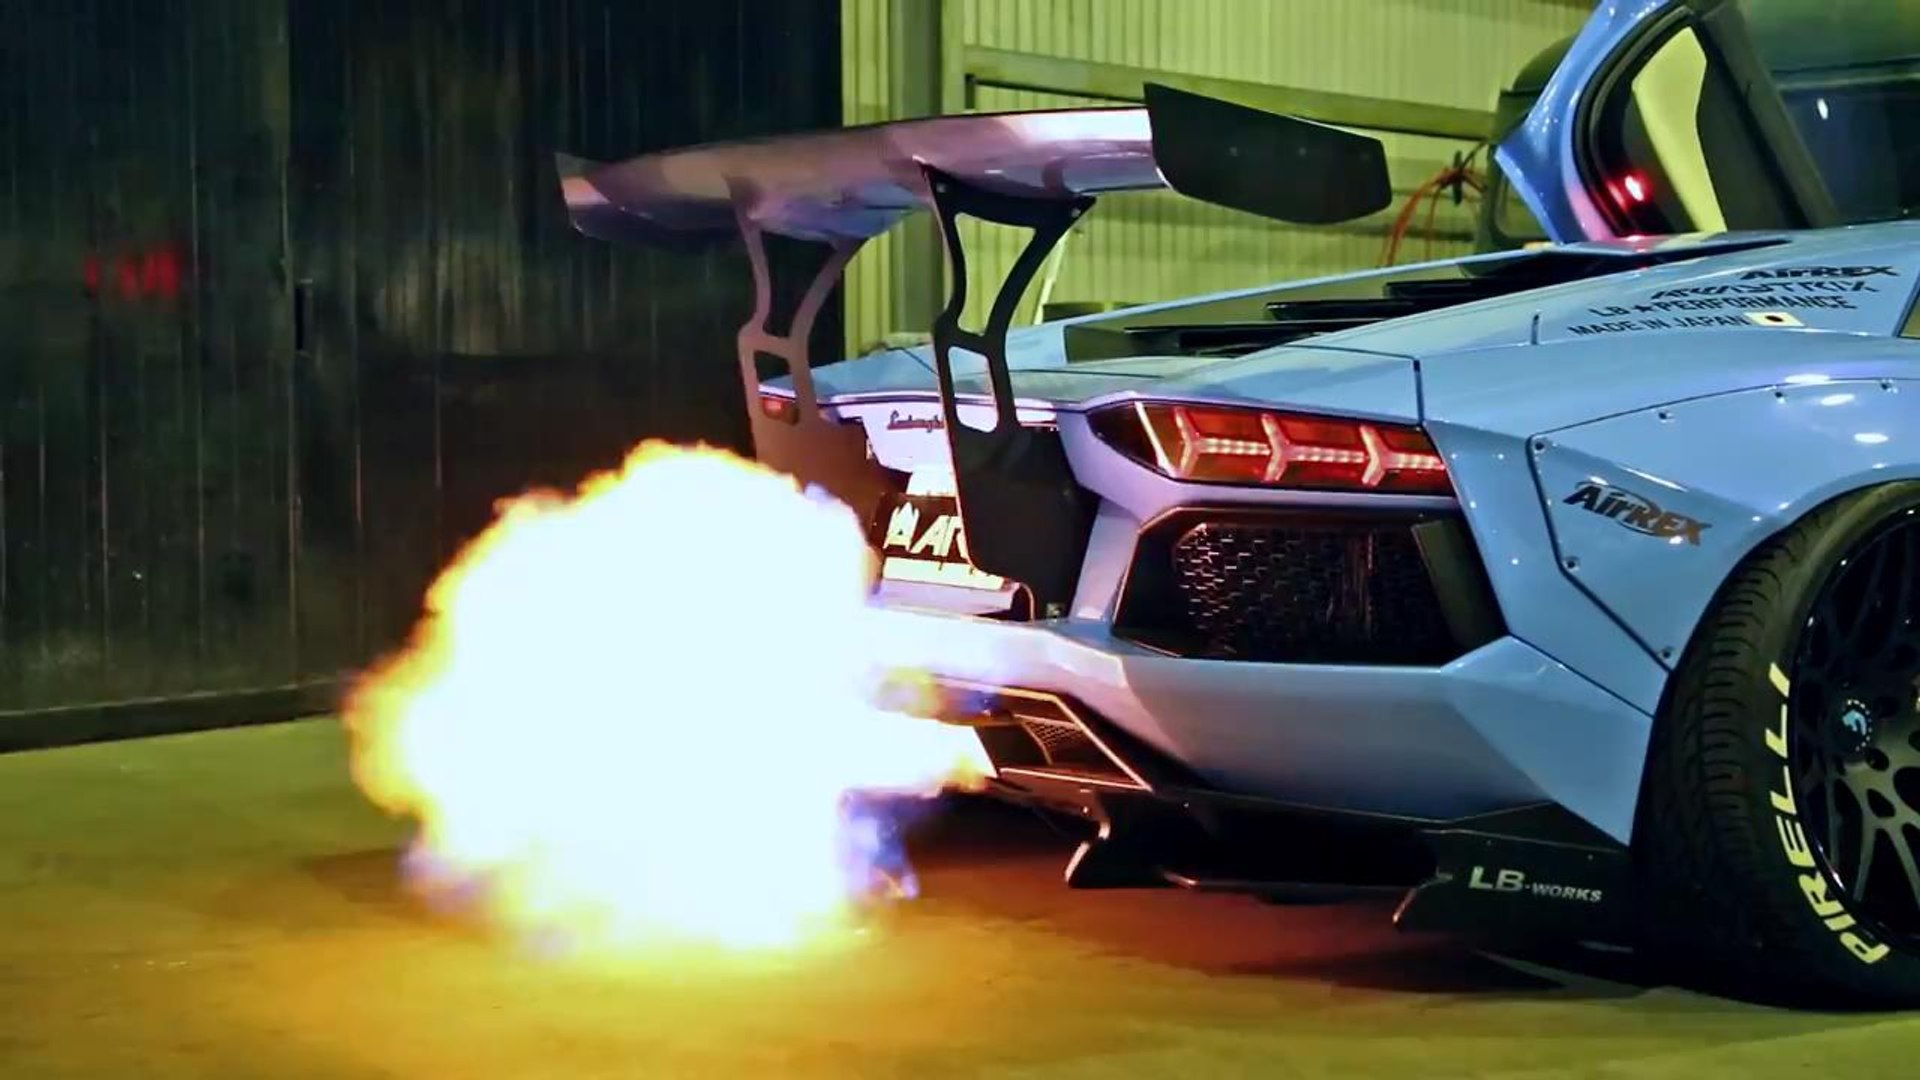 lamborghini aventador lp720 4 insane flames and exhaust sound